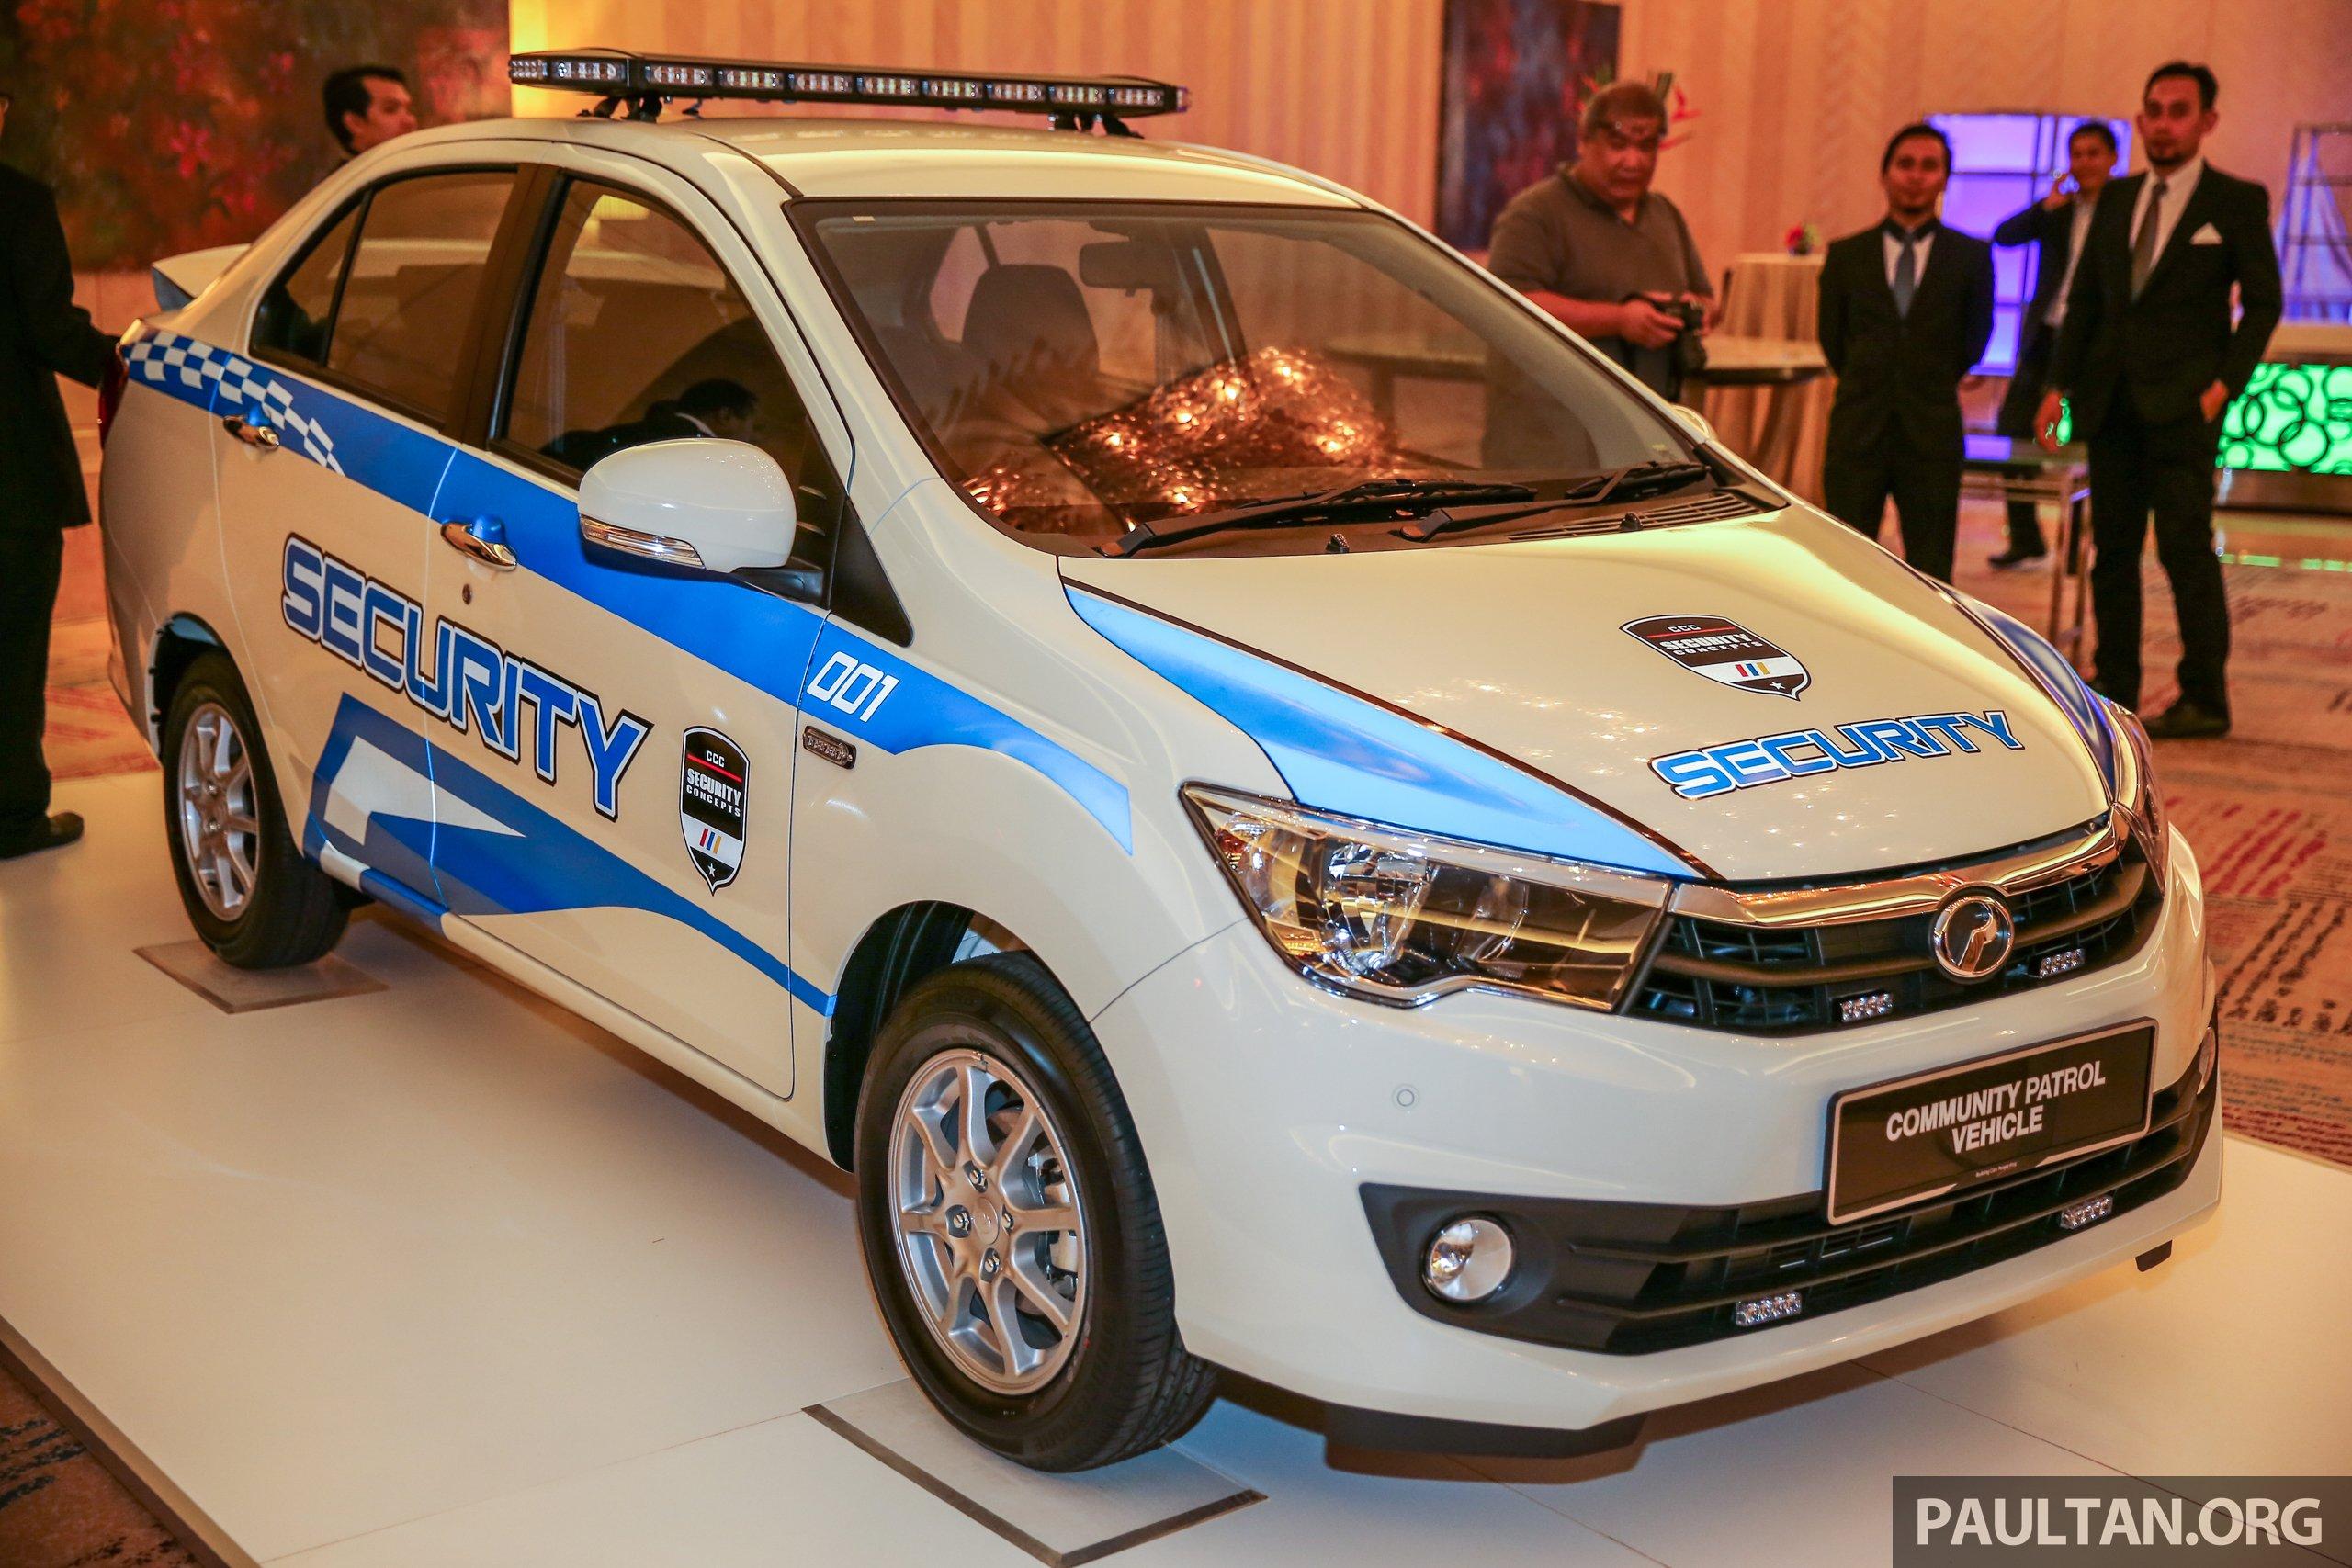 Perodua Bezza security patrol car displayed at launch